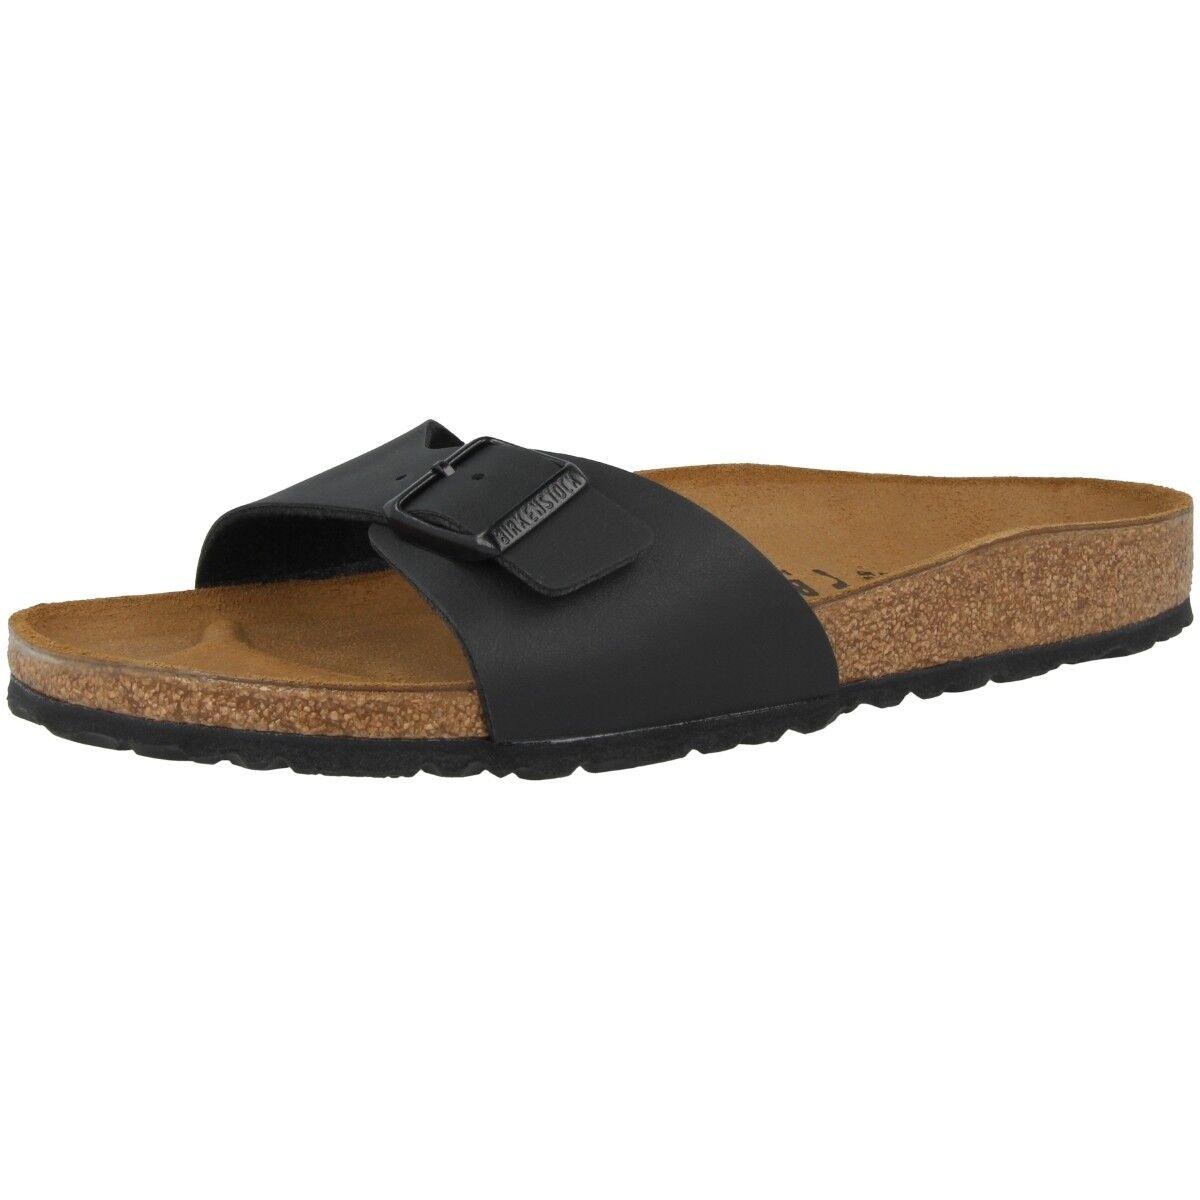 Birkenstock 040791 Madrid Birko-Flor Schuhe black 040791 Birkenstock Damen Pantolette Weite normal 6c10e7